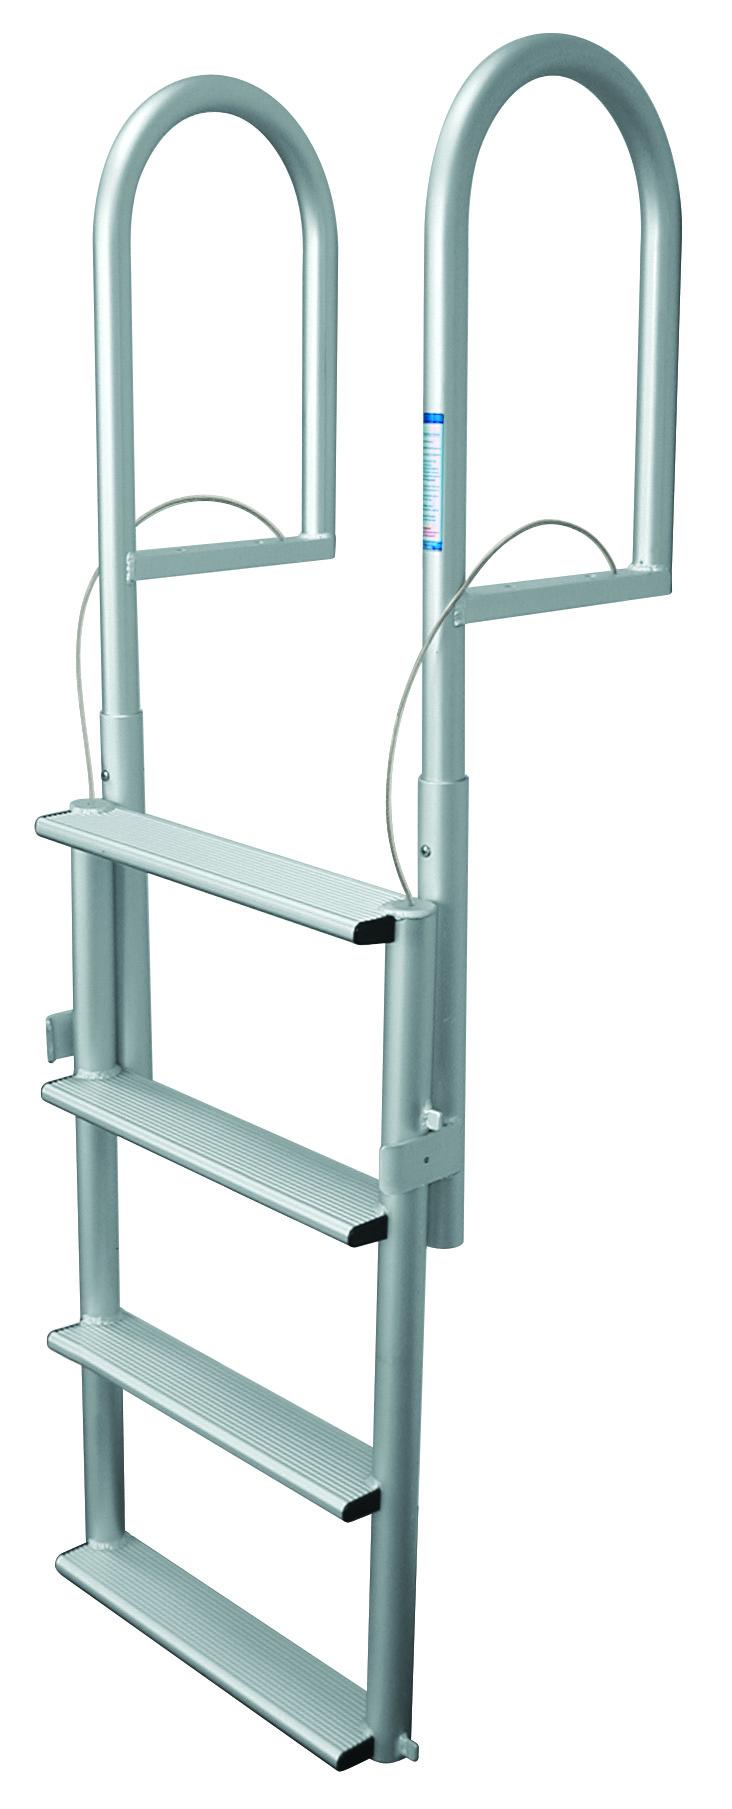 Jif Marine Lifting Dock Ladder 3 4 5 Or 7 Step Ladders